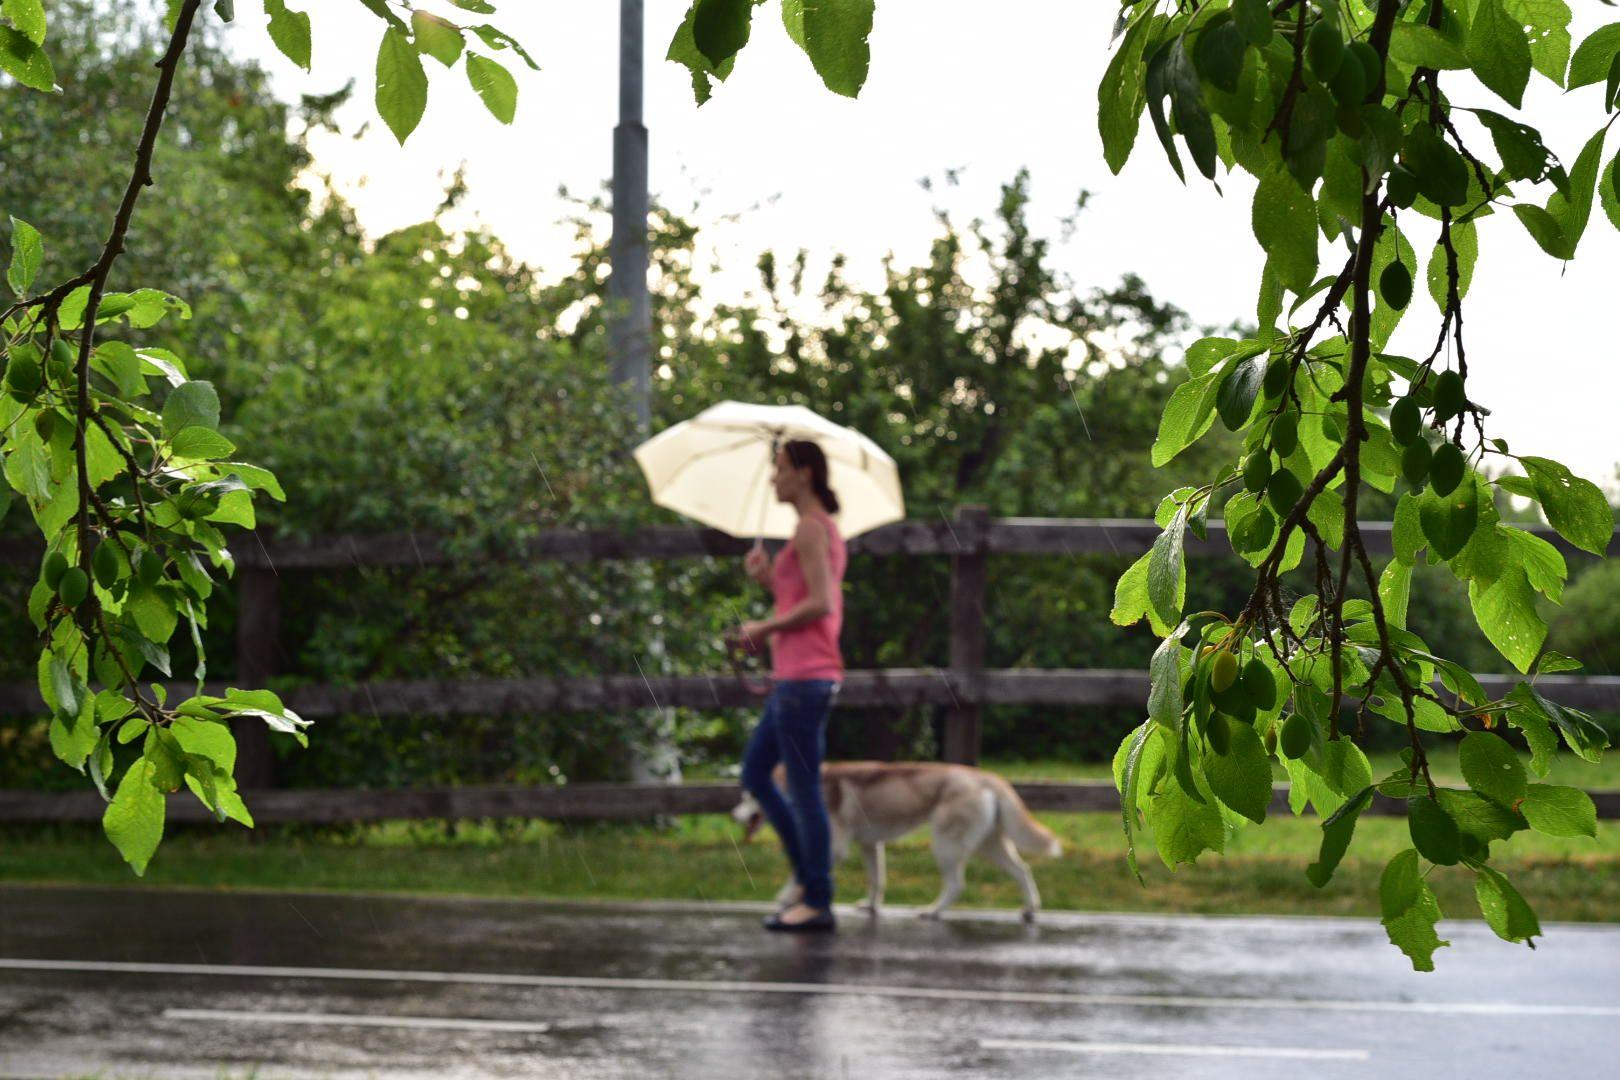 Синоптики пообещали москвичам пасмурную погоду